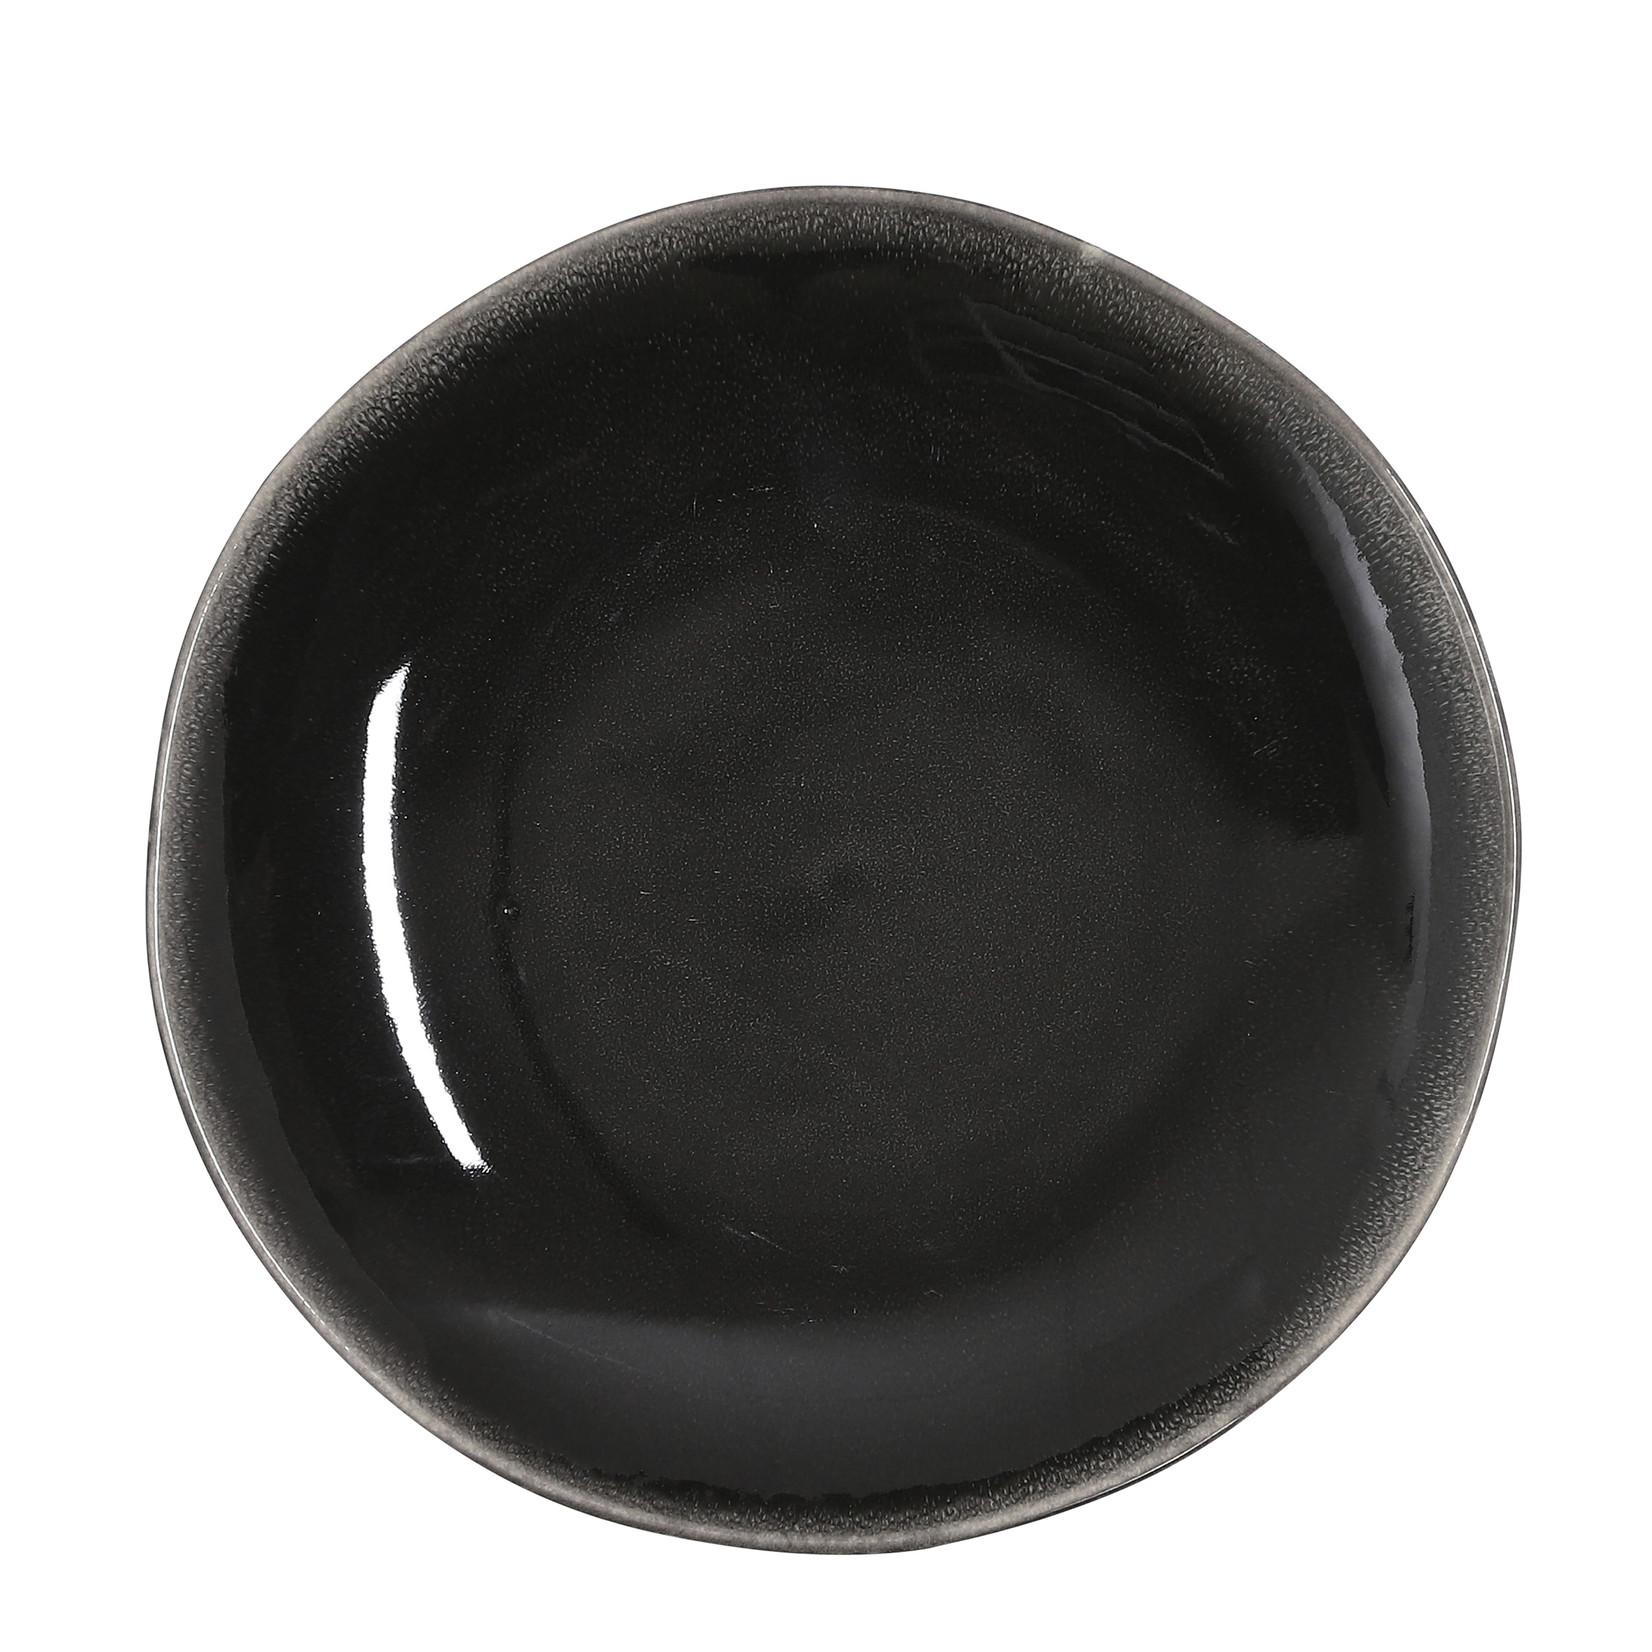 MiCa Tabo dinerplate black